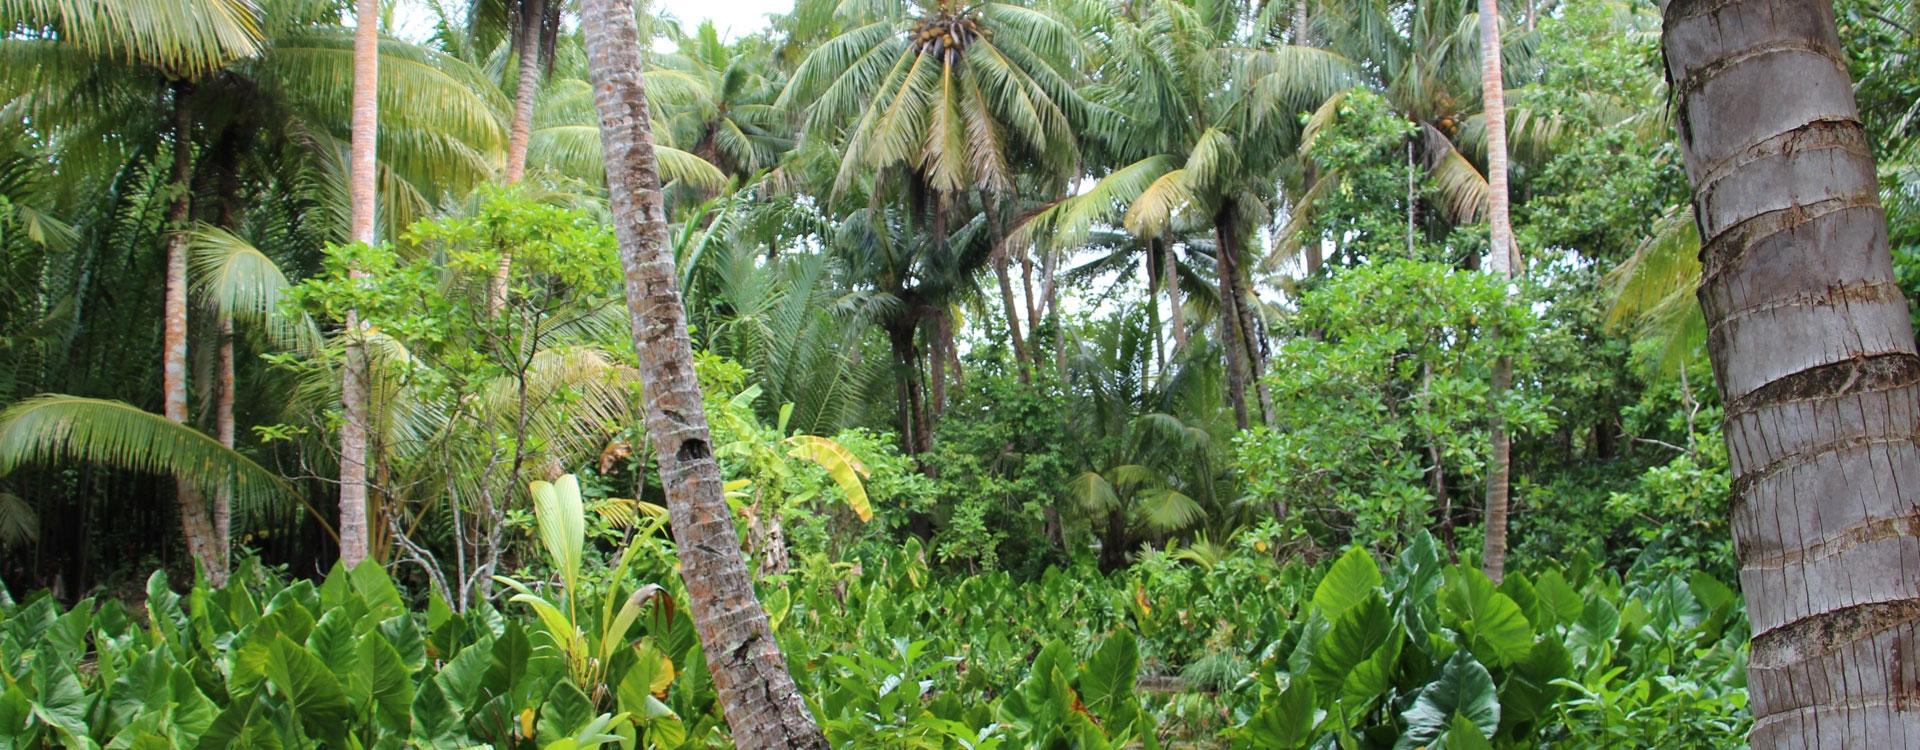 Coastal Agroforest